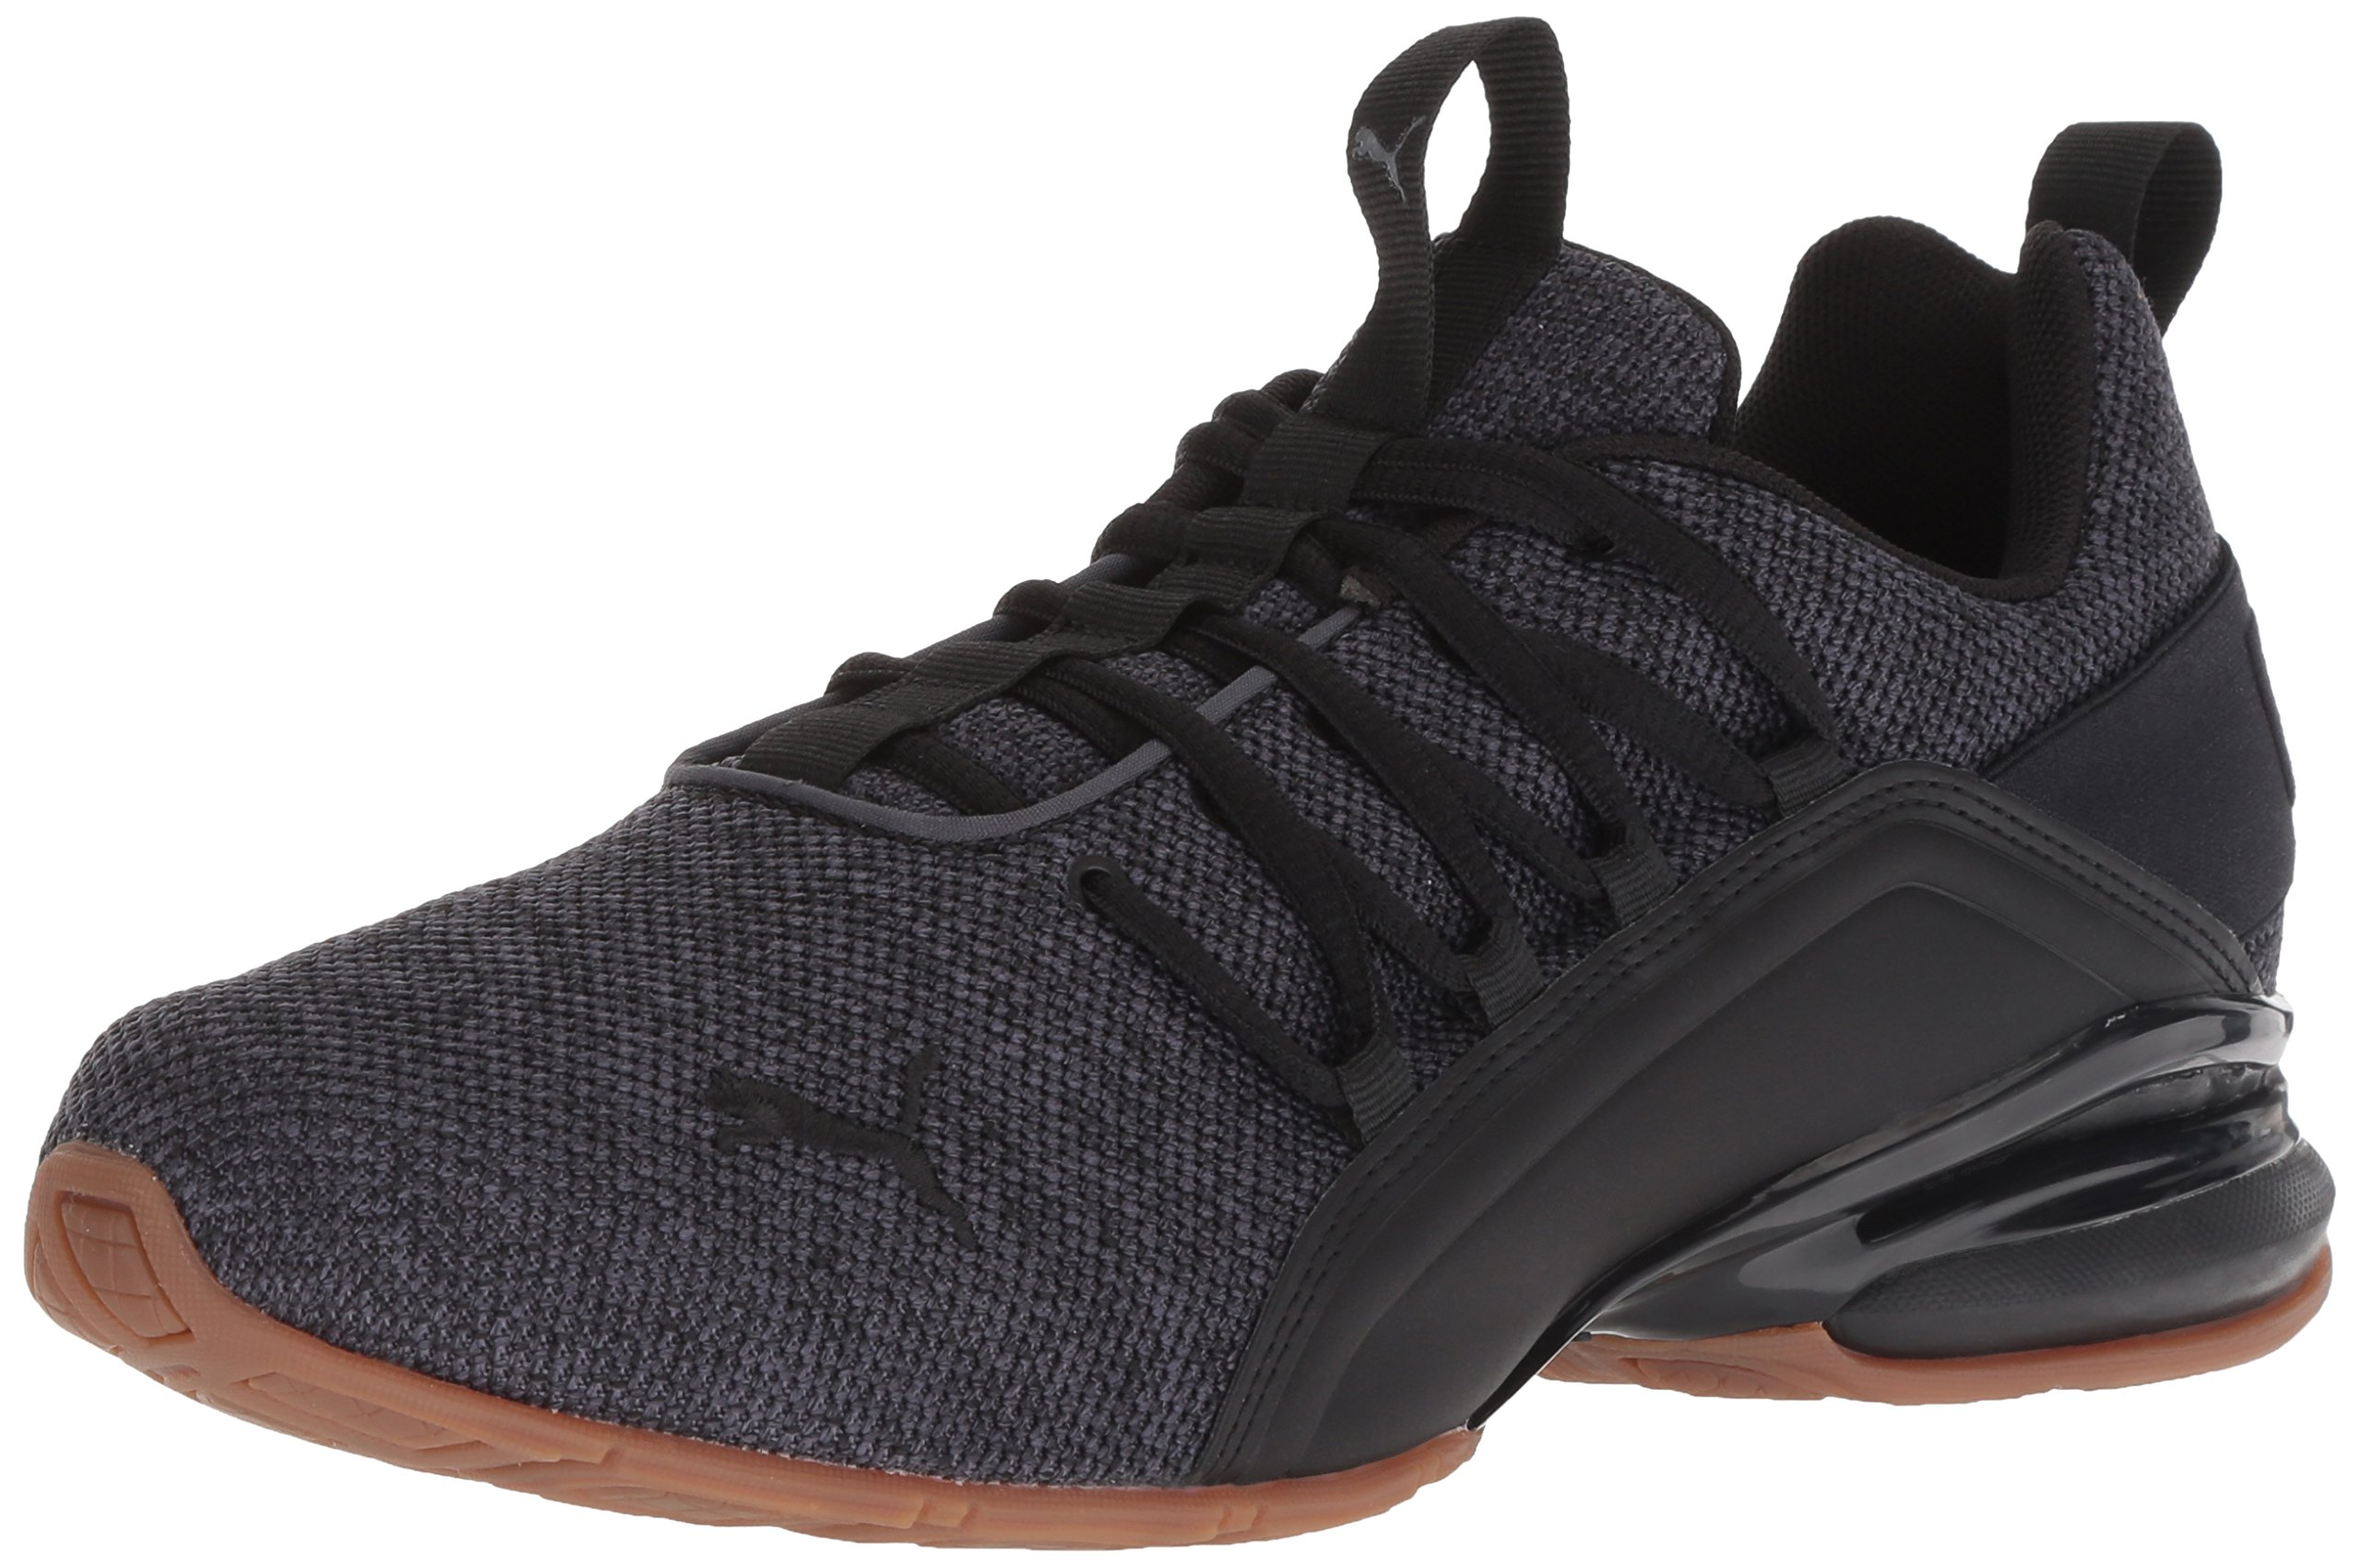 PUMA Men's Axelion Sneaker, Asphalt Black, 10.5 M US